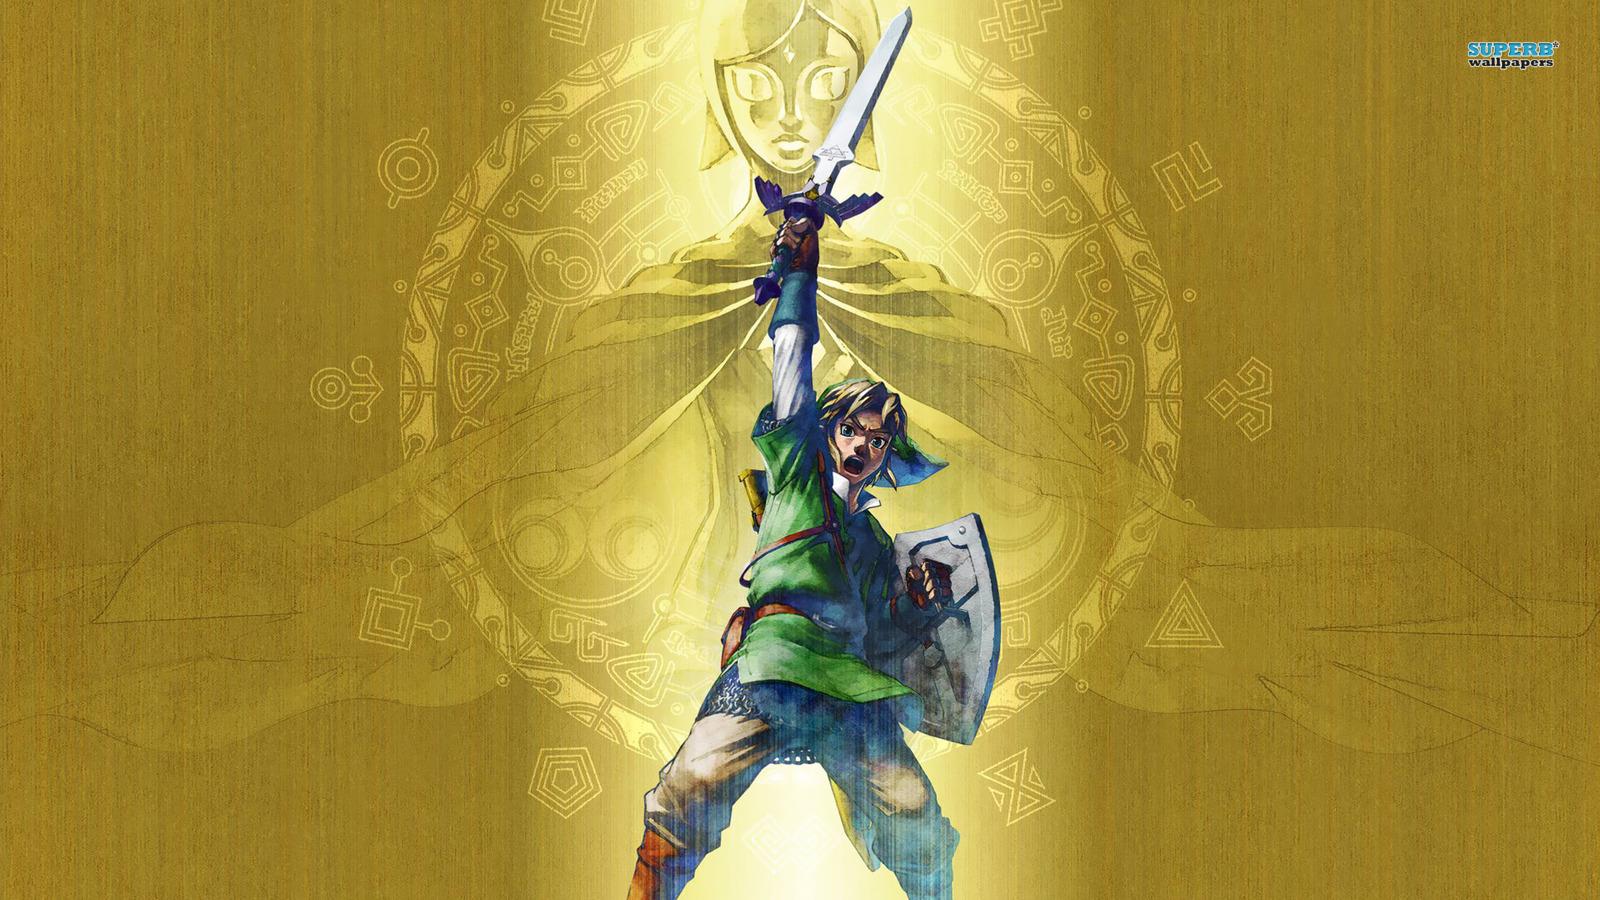 Skyward-Sword-video-games-38705505-1600-